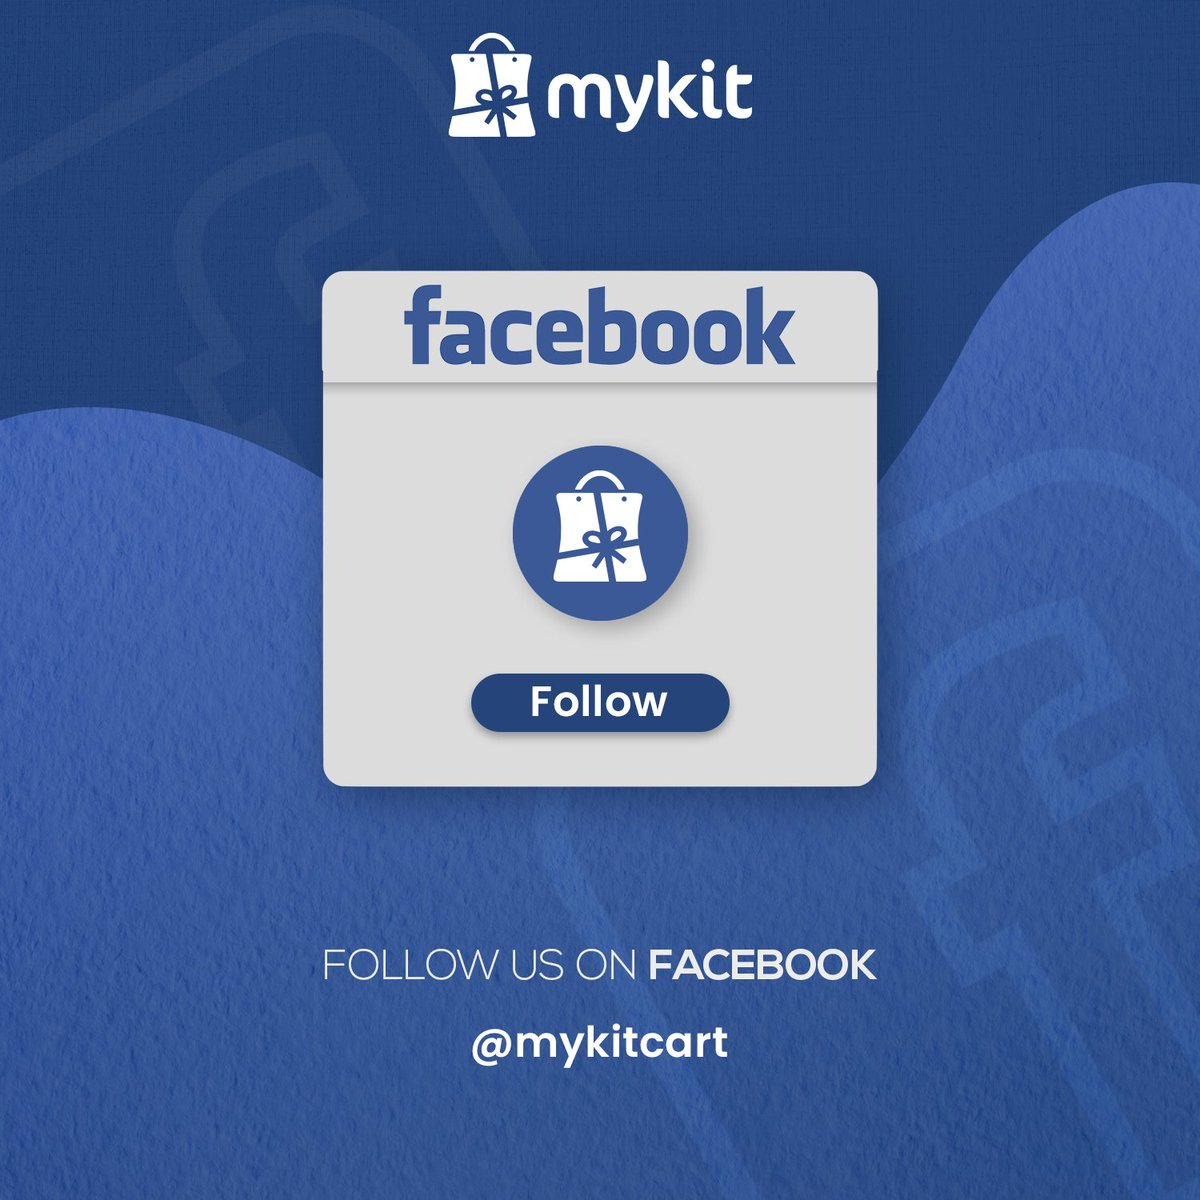 Stay connected...Stay updated...  #mykitcart #mykit #follow #followus #onlineshopping #brandyourhome #kannur #kerala https://t.co/T1JmD2gvg1